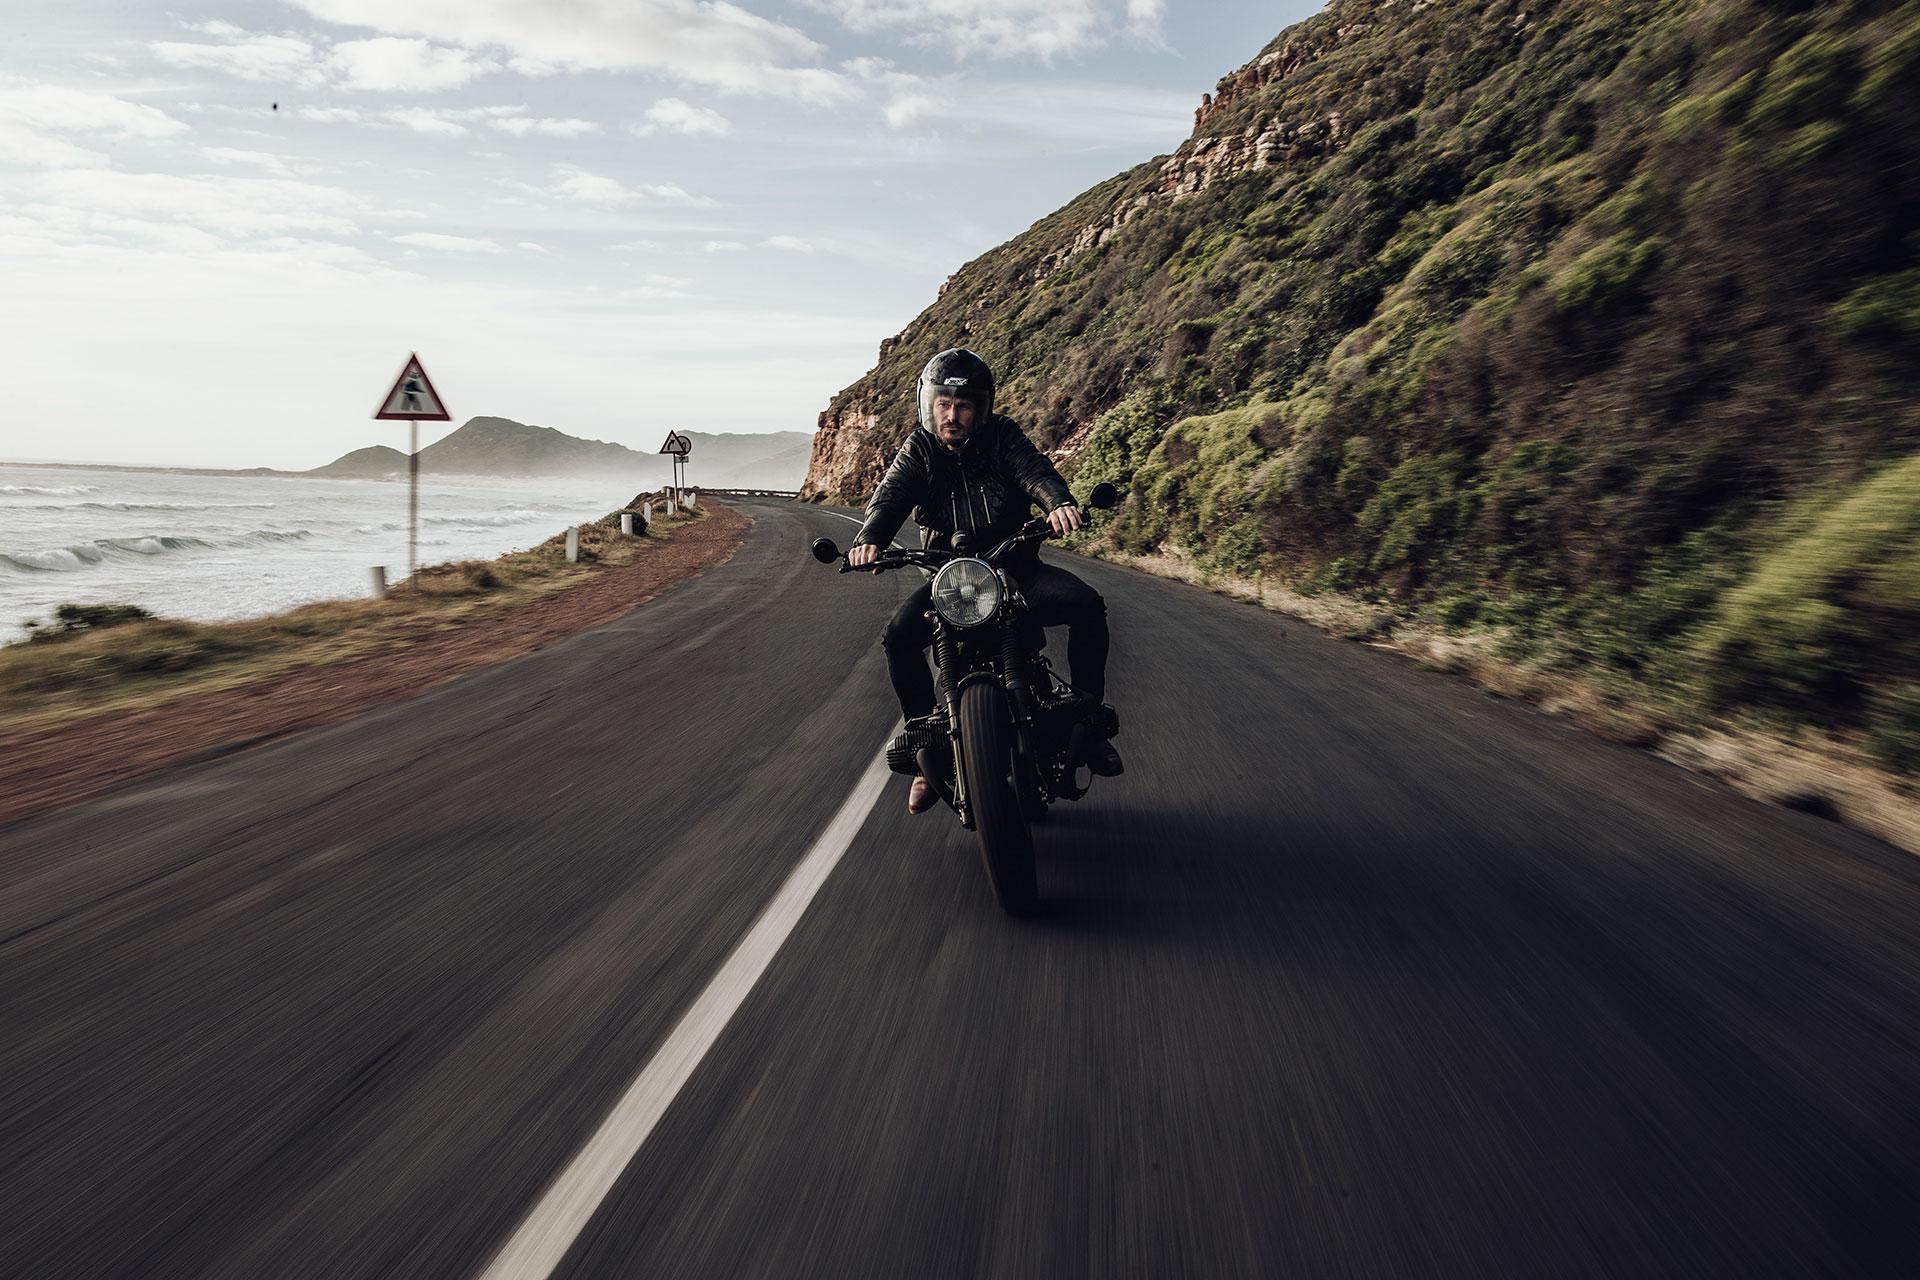 CafeRacer Motorrad Scrambler BMW Automotive Fotograf Lifestyle